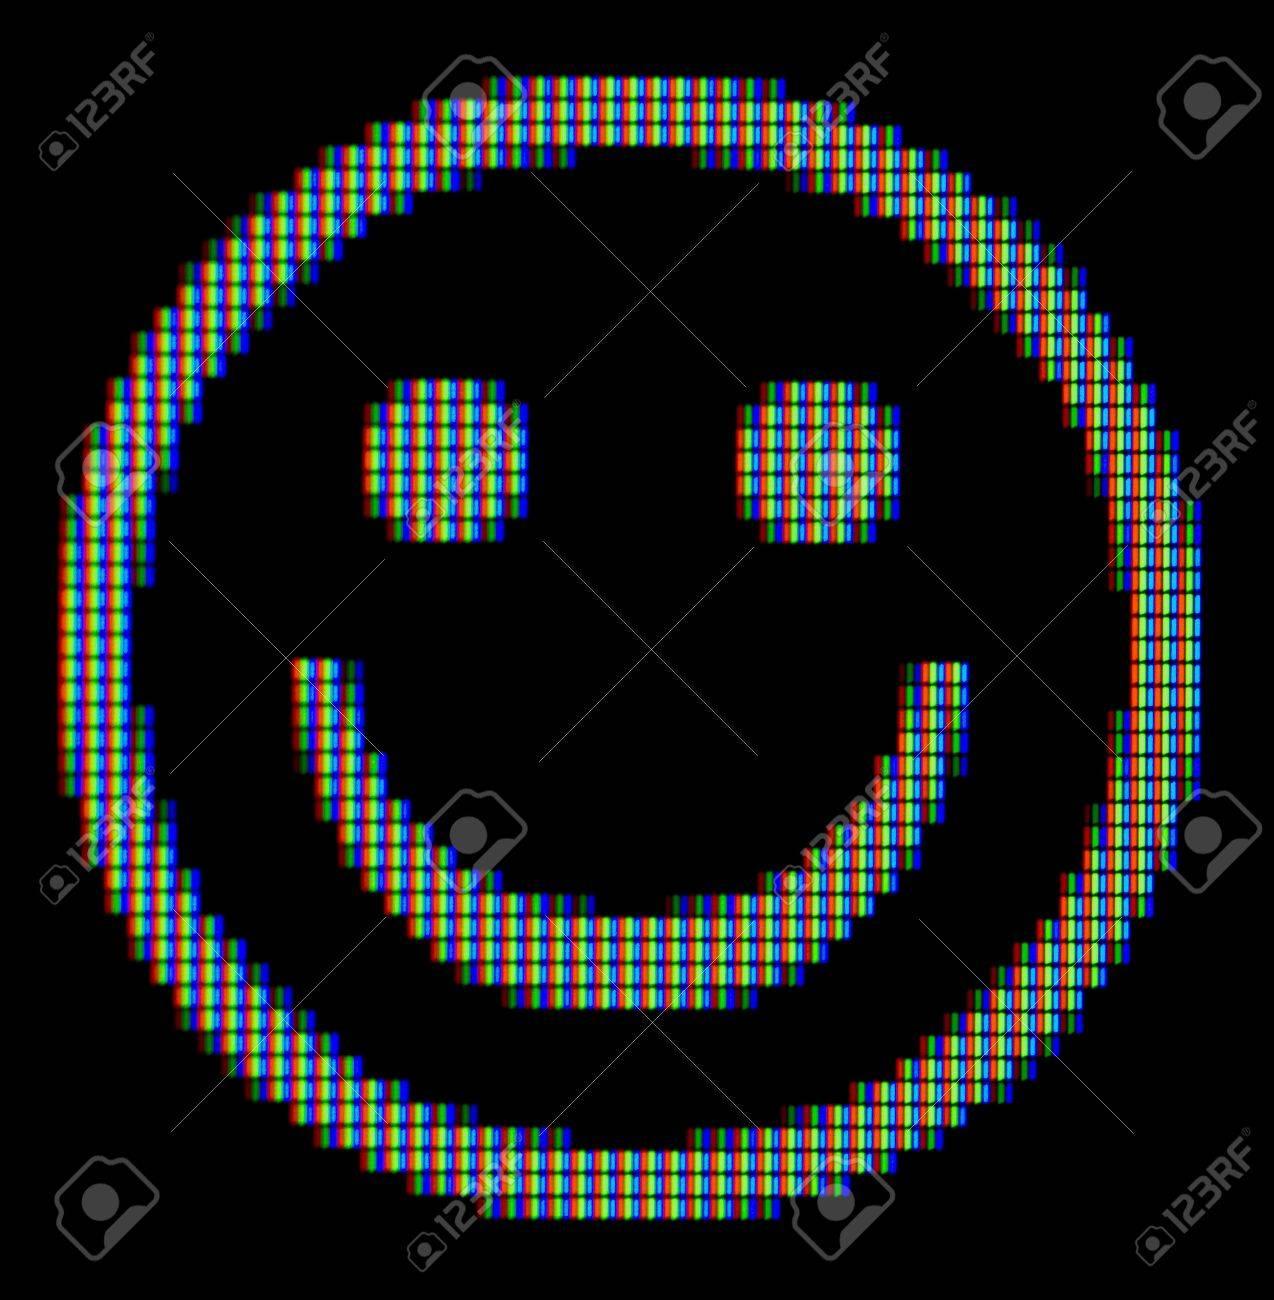 Smiley symbol copy paste image collections symbol and sign ideas smiley symbol copy paste images symbol and sign ideas close up of a smiley symbol on buycottarizona